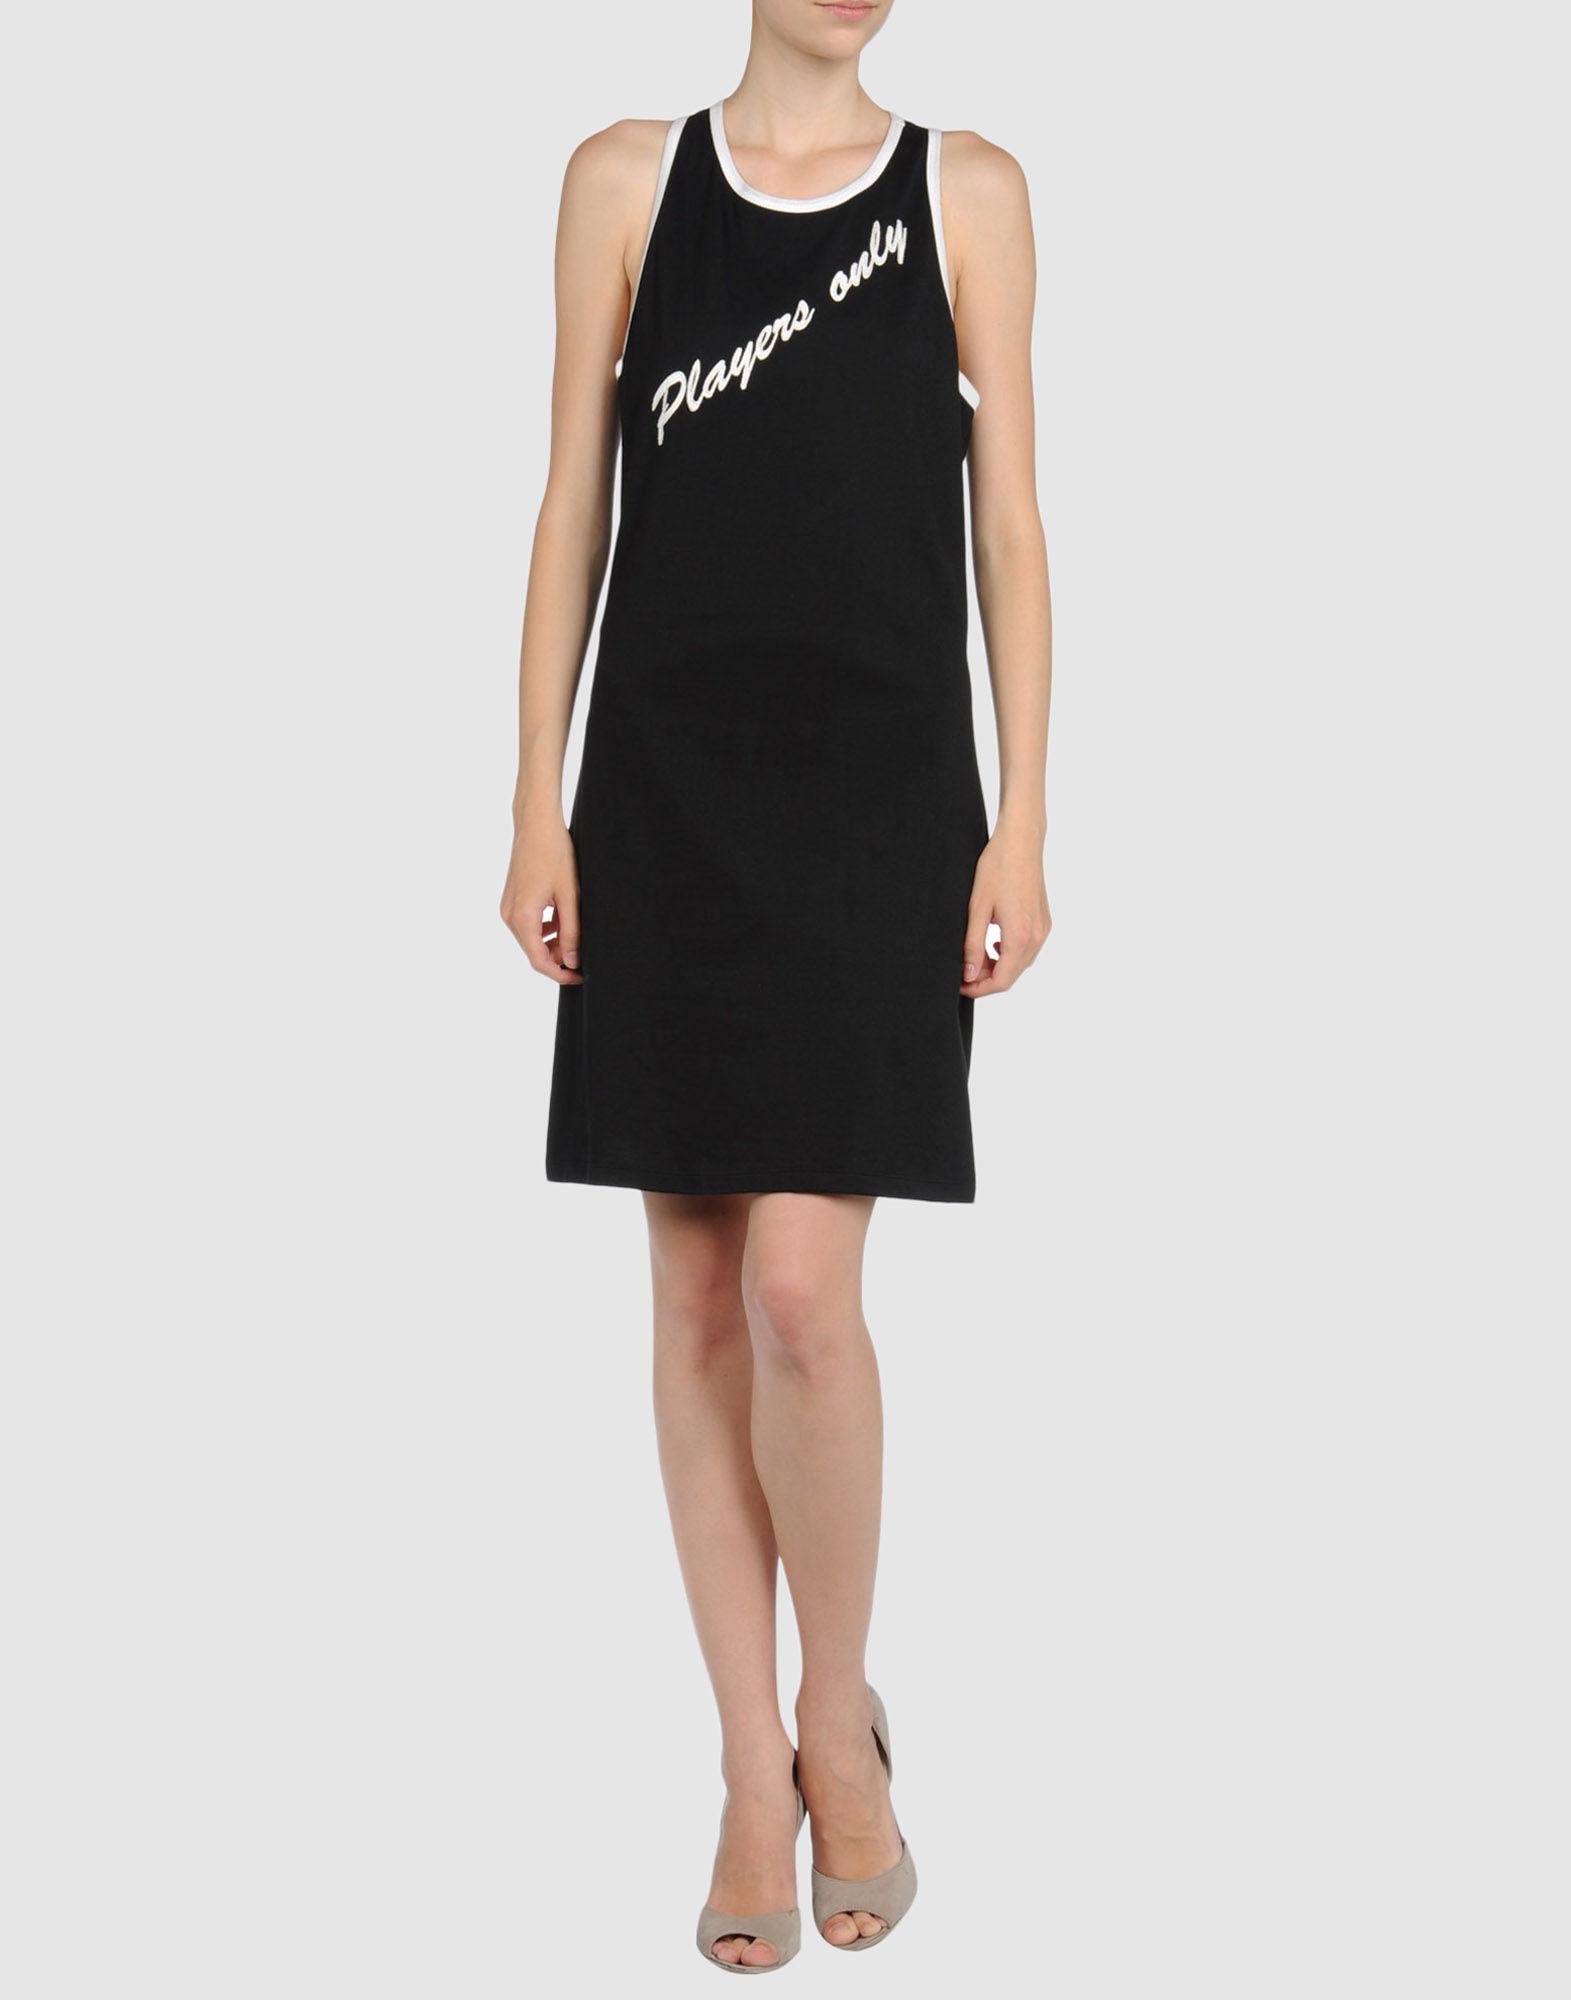 34203621VG 14 f - Casual Φορεματα Versace 2011 2012 Κωδ.03